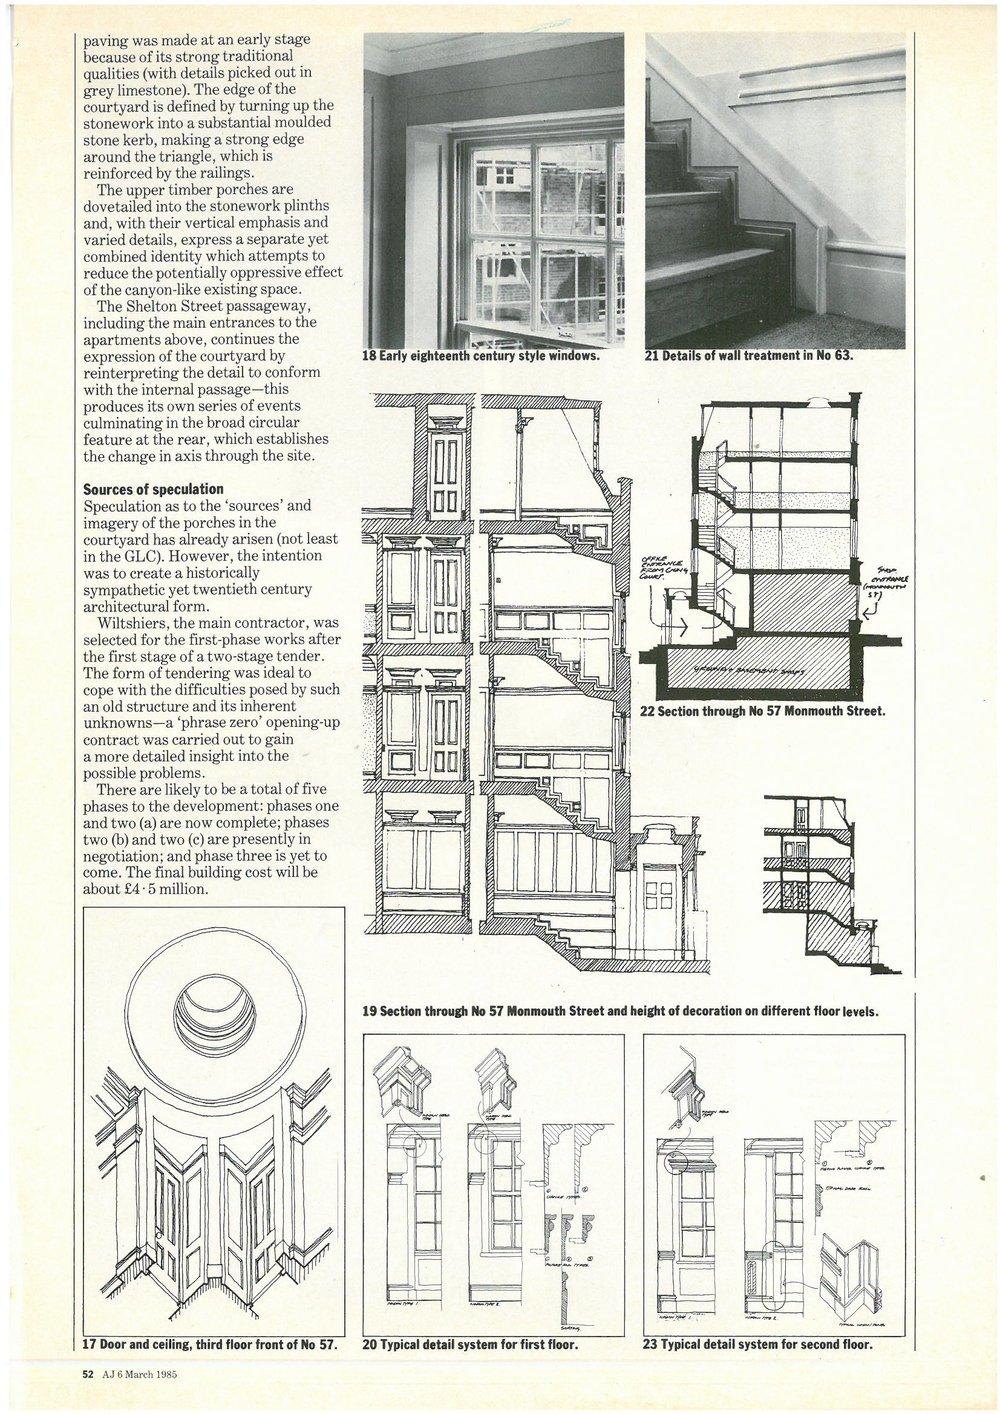 Comyn Ching Triangle_AJ 06 March1985_Page_06.jpg